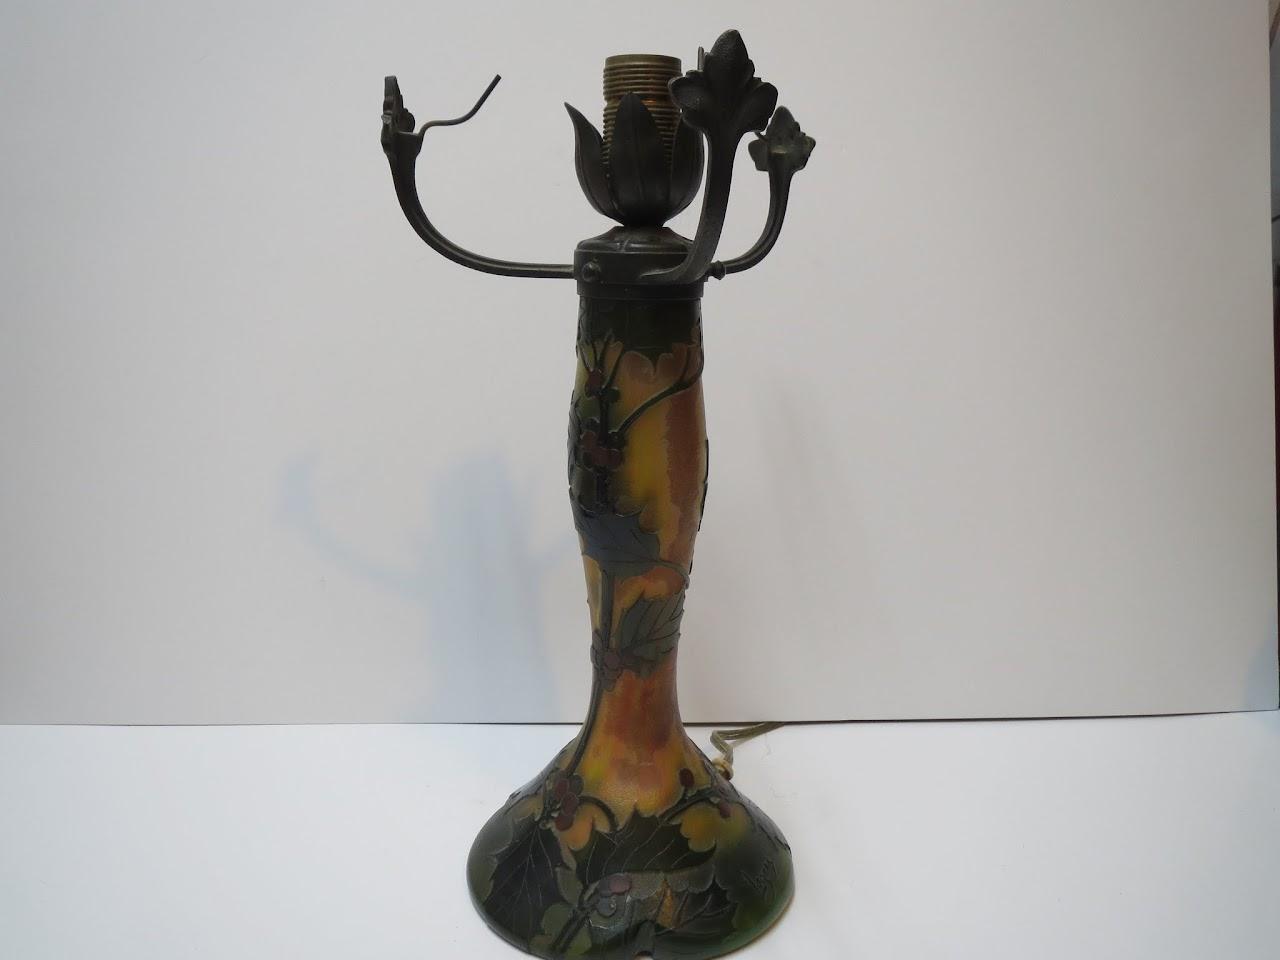 Antique Legras Glass Lamp